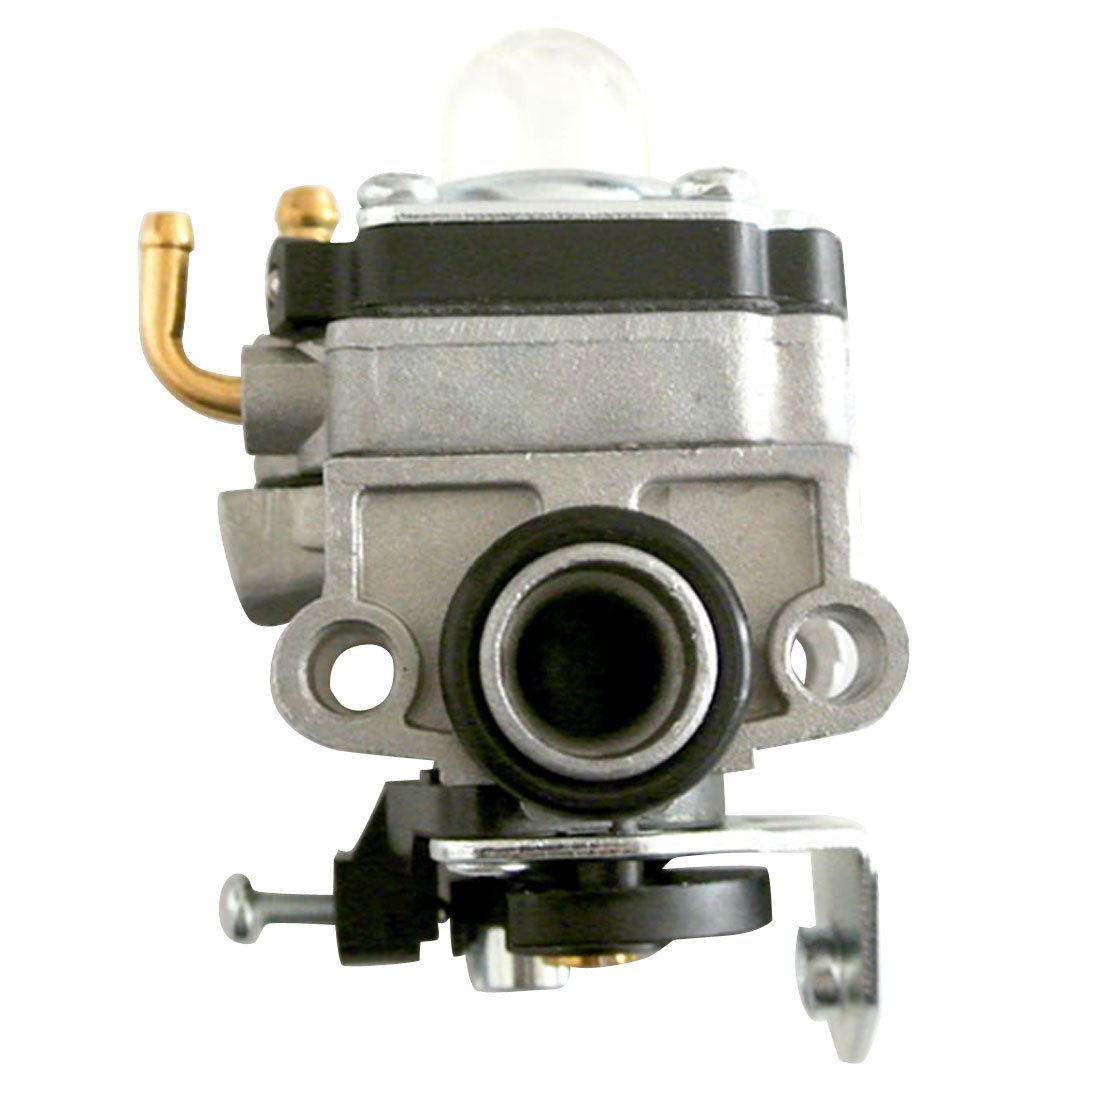 JRL Carburetor For HONDA 4 Cycle Engine GX31 GX22 FG100 Little Wonder Mantis Tiller Huang Machinery